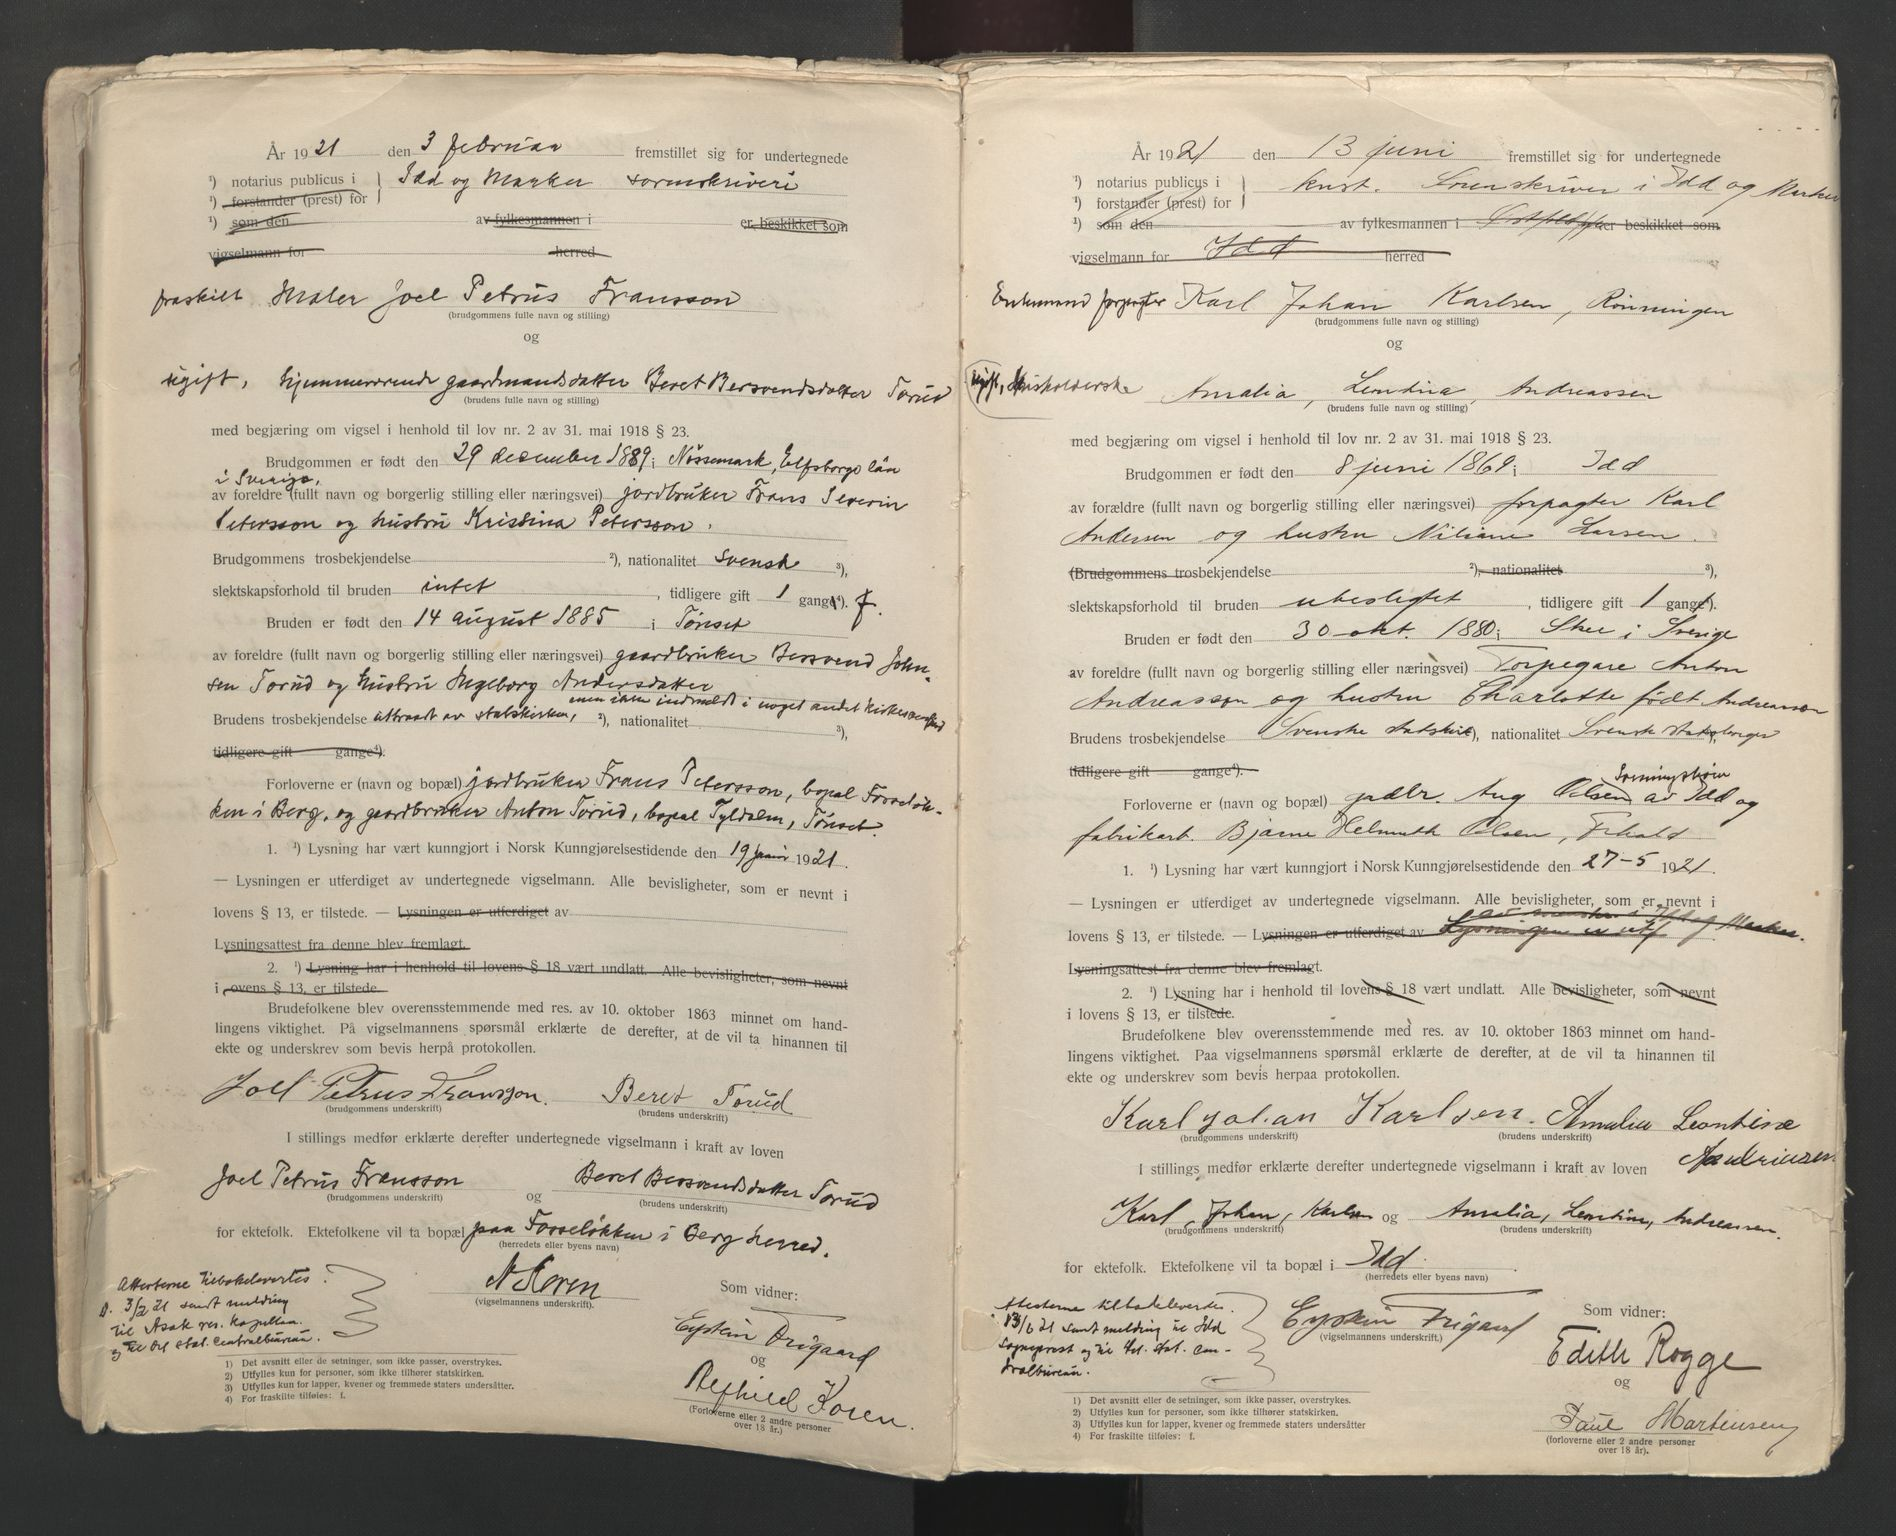 SAO, Idd og Marker sorenskriveri, L/Lc/L0001: Vigselsbøker, 1920-1942, s. 7